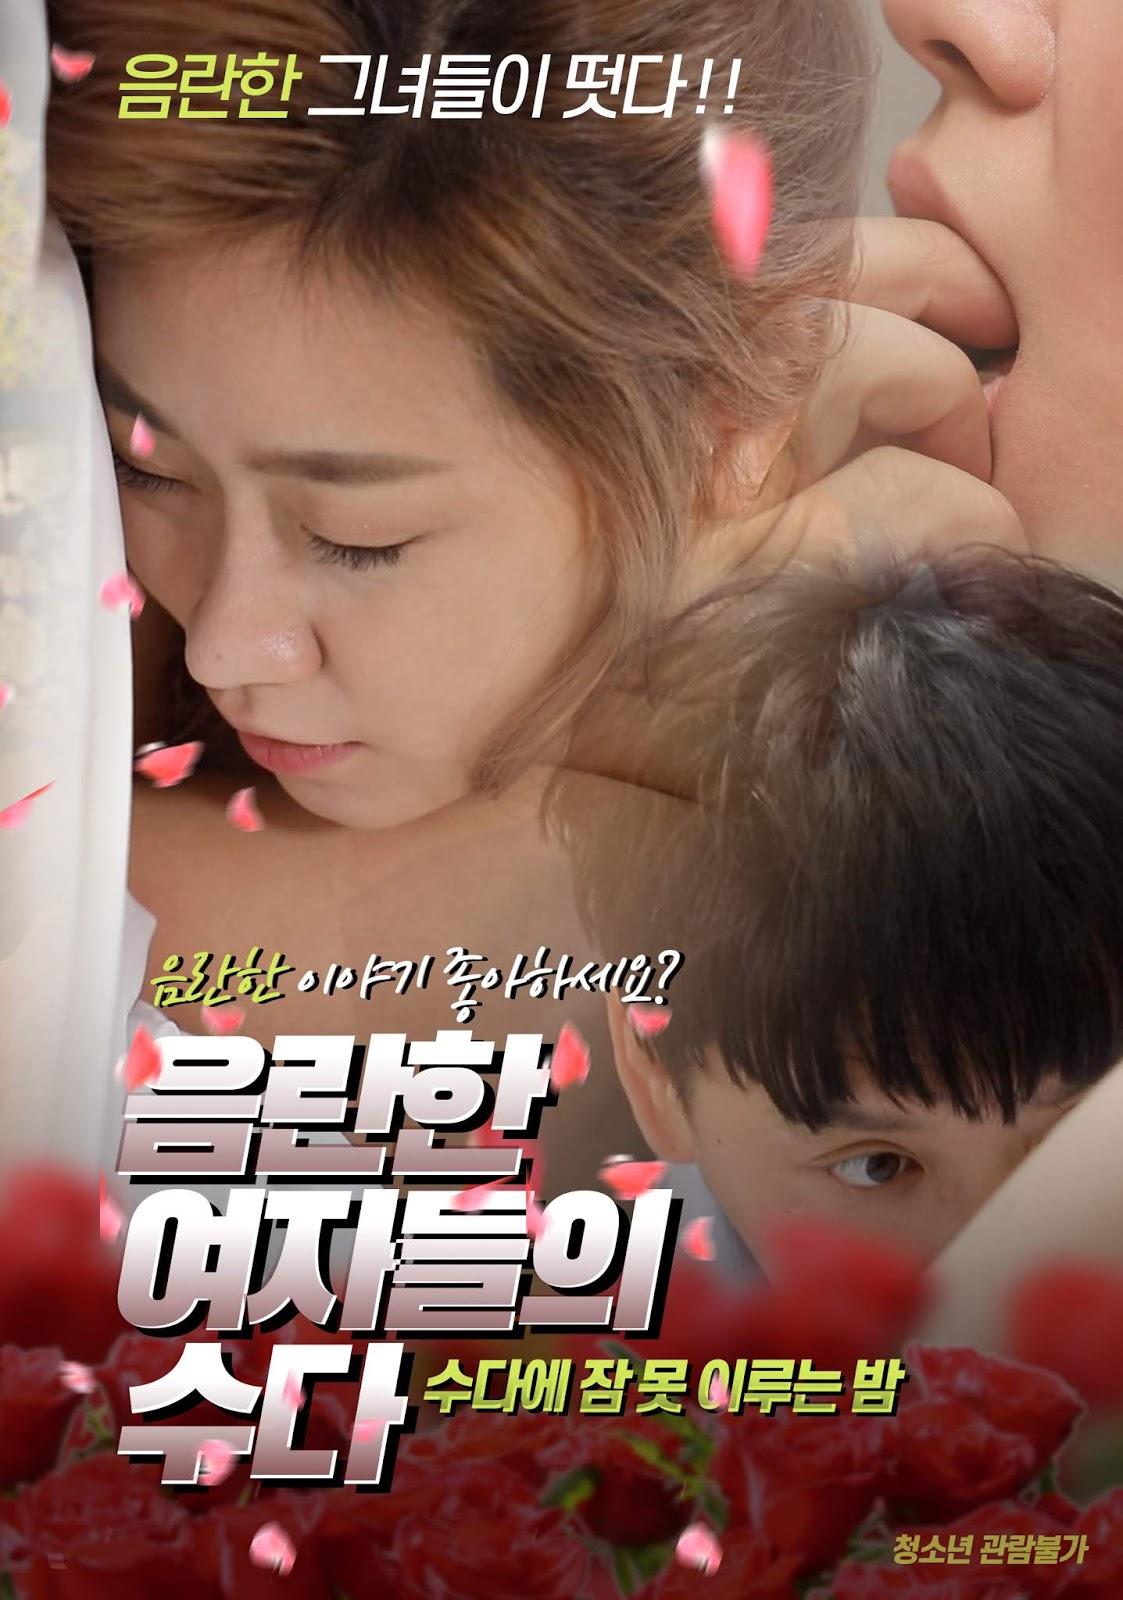 Chattering Full Korea 18+ Adult Movie Online Free